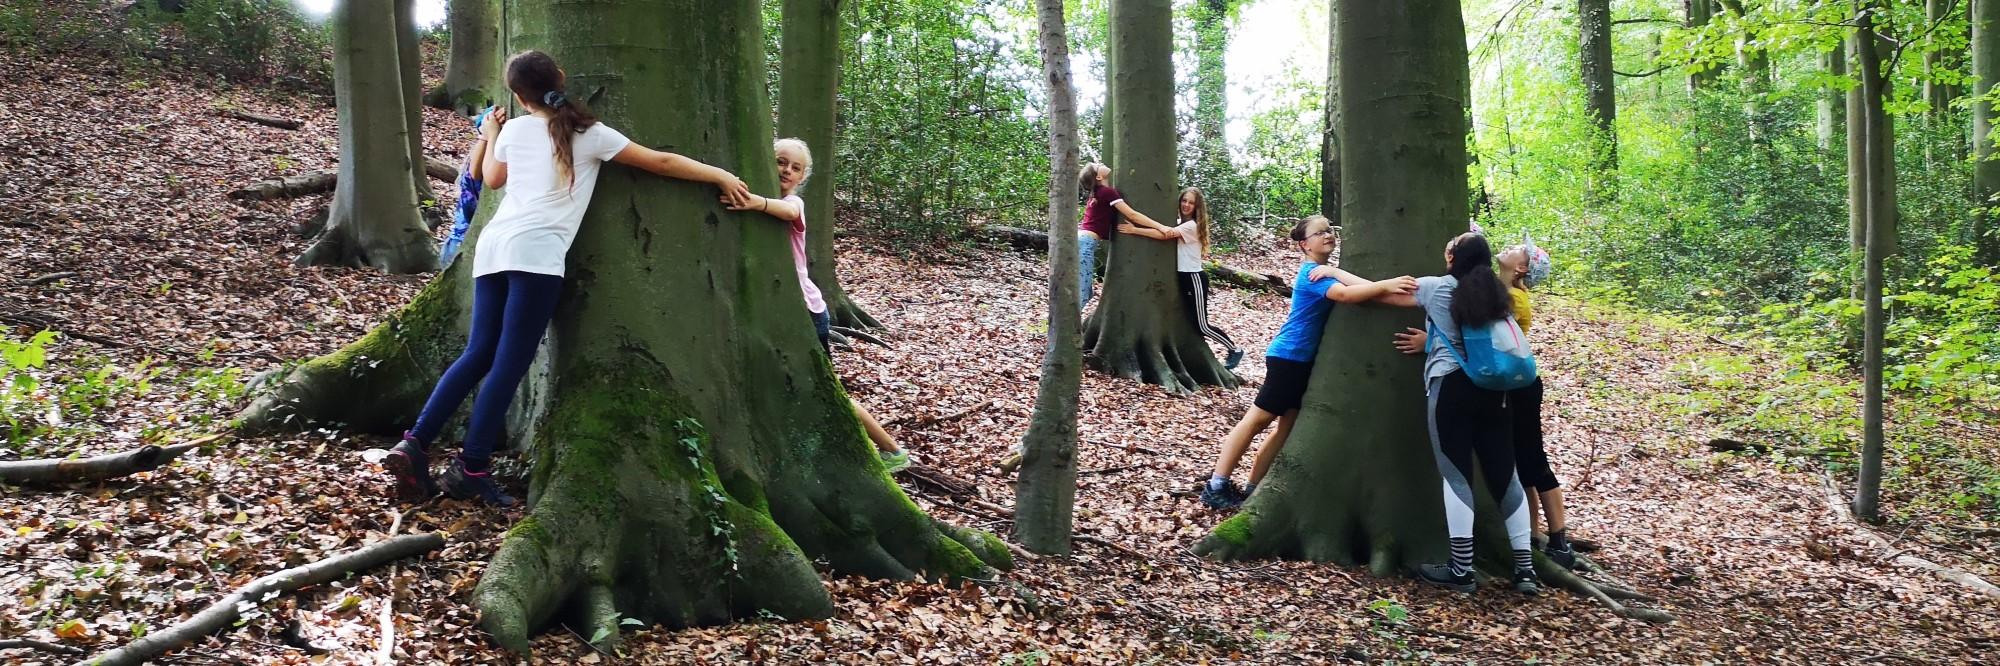 Mädchengruppen umarmen große Bäume